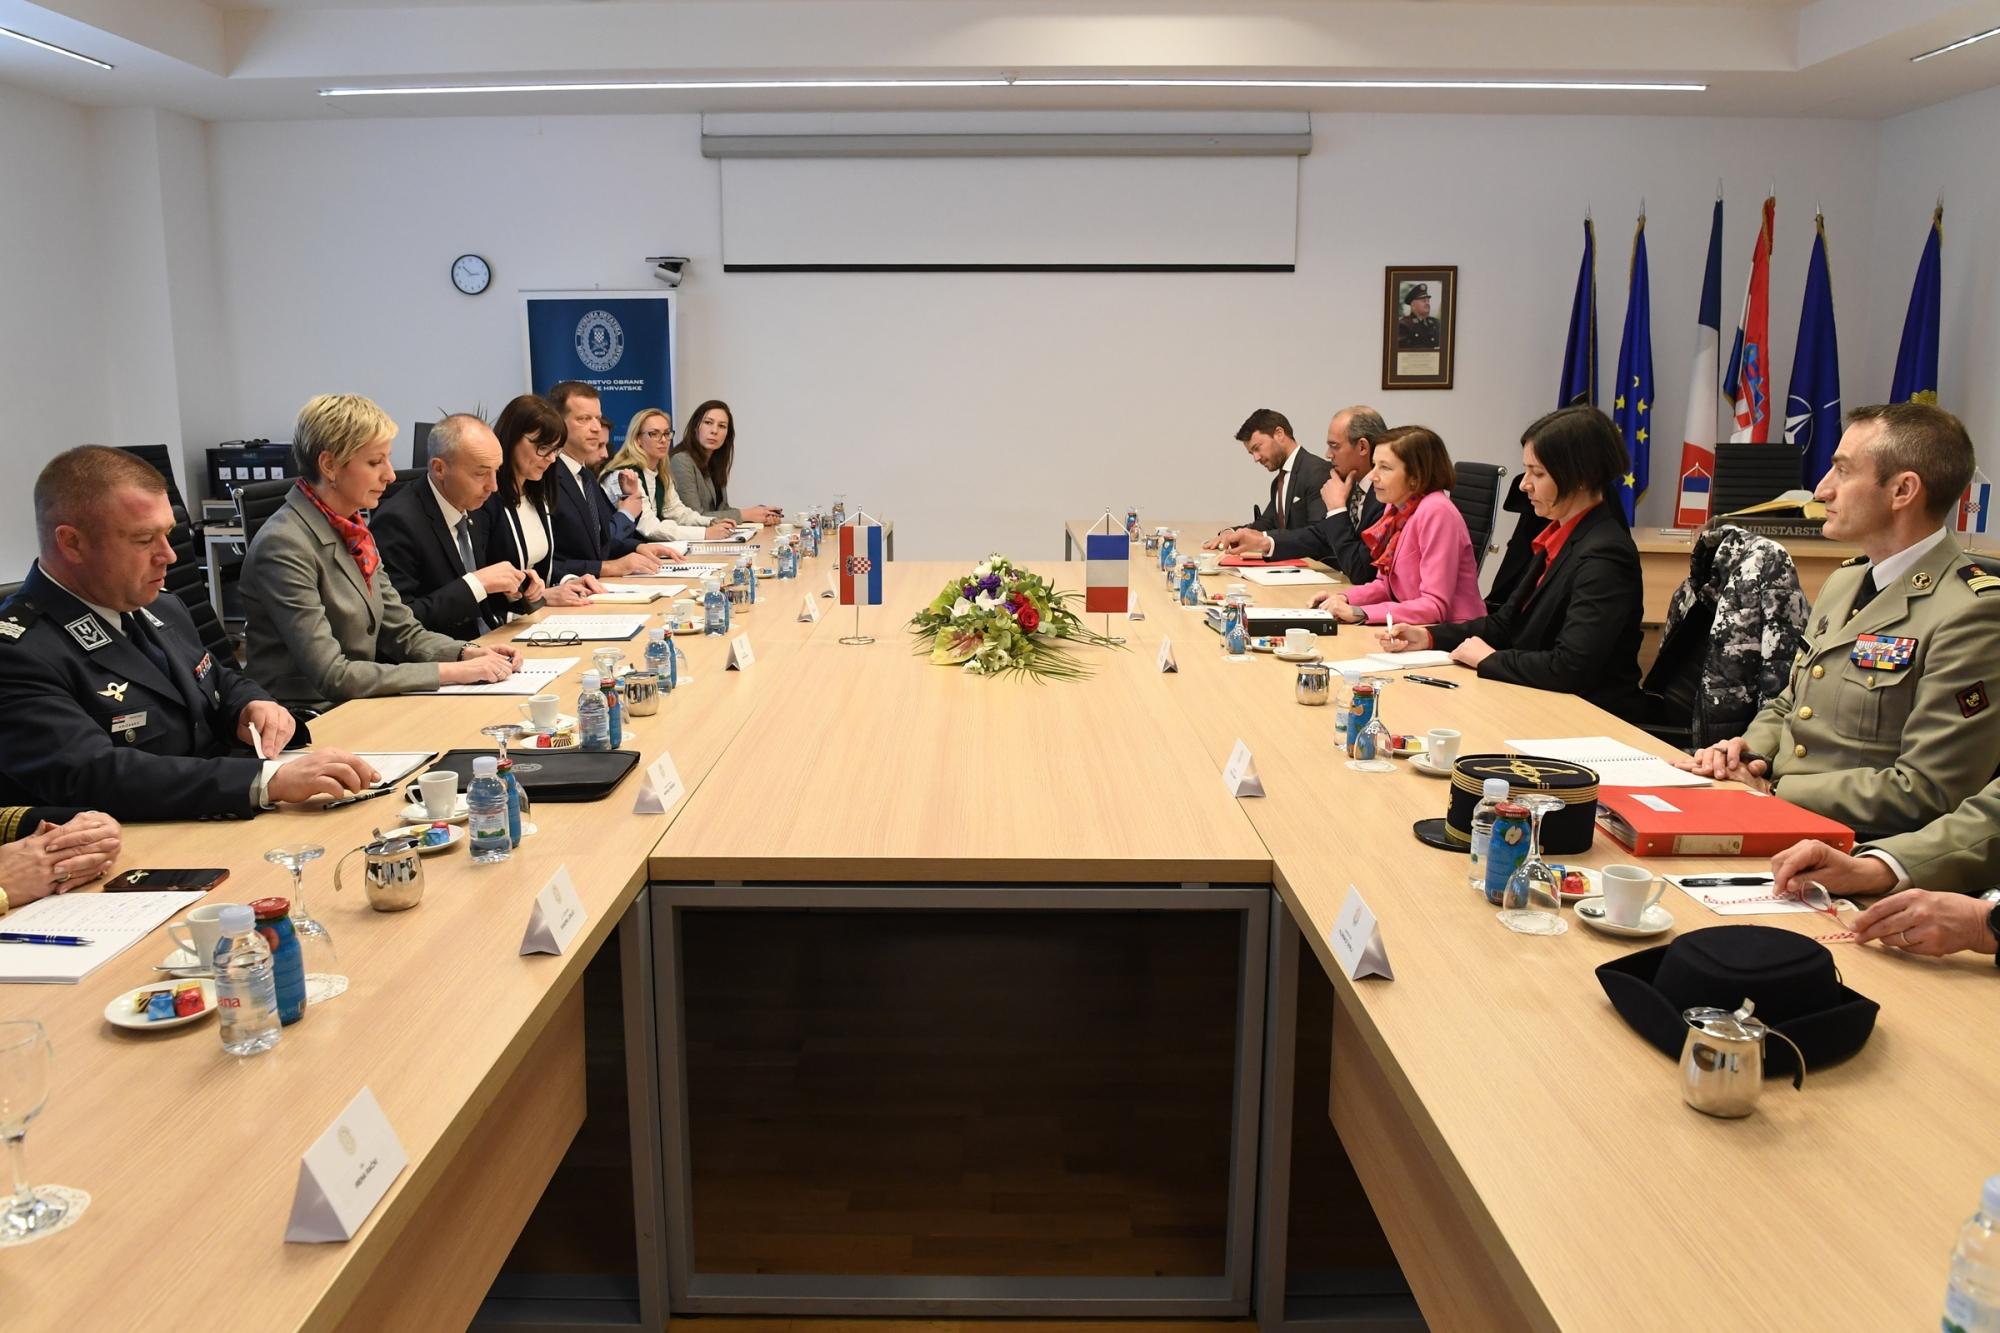 Ministar Krstičević sa francuskom ministricom Parly u MORH-u | Foto: MORH / J. Kopi